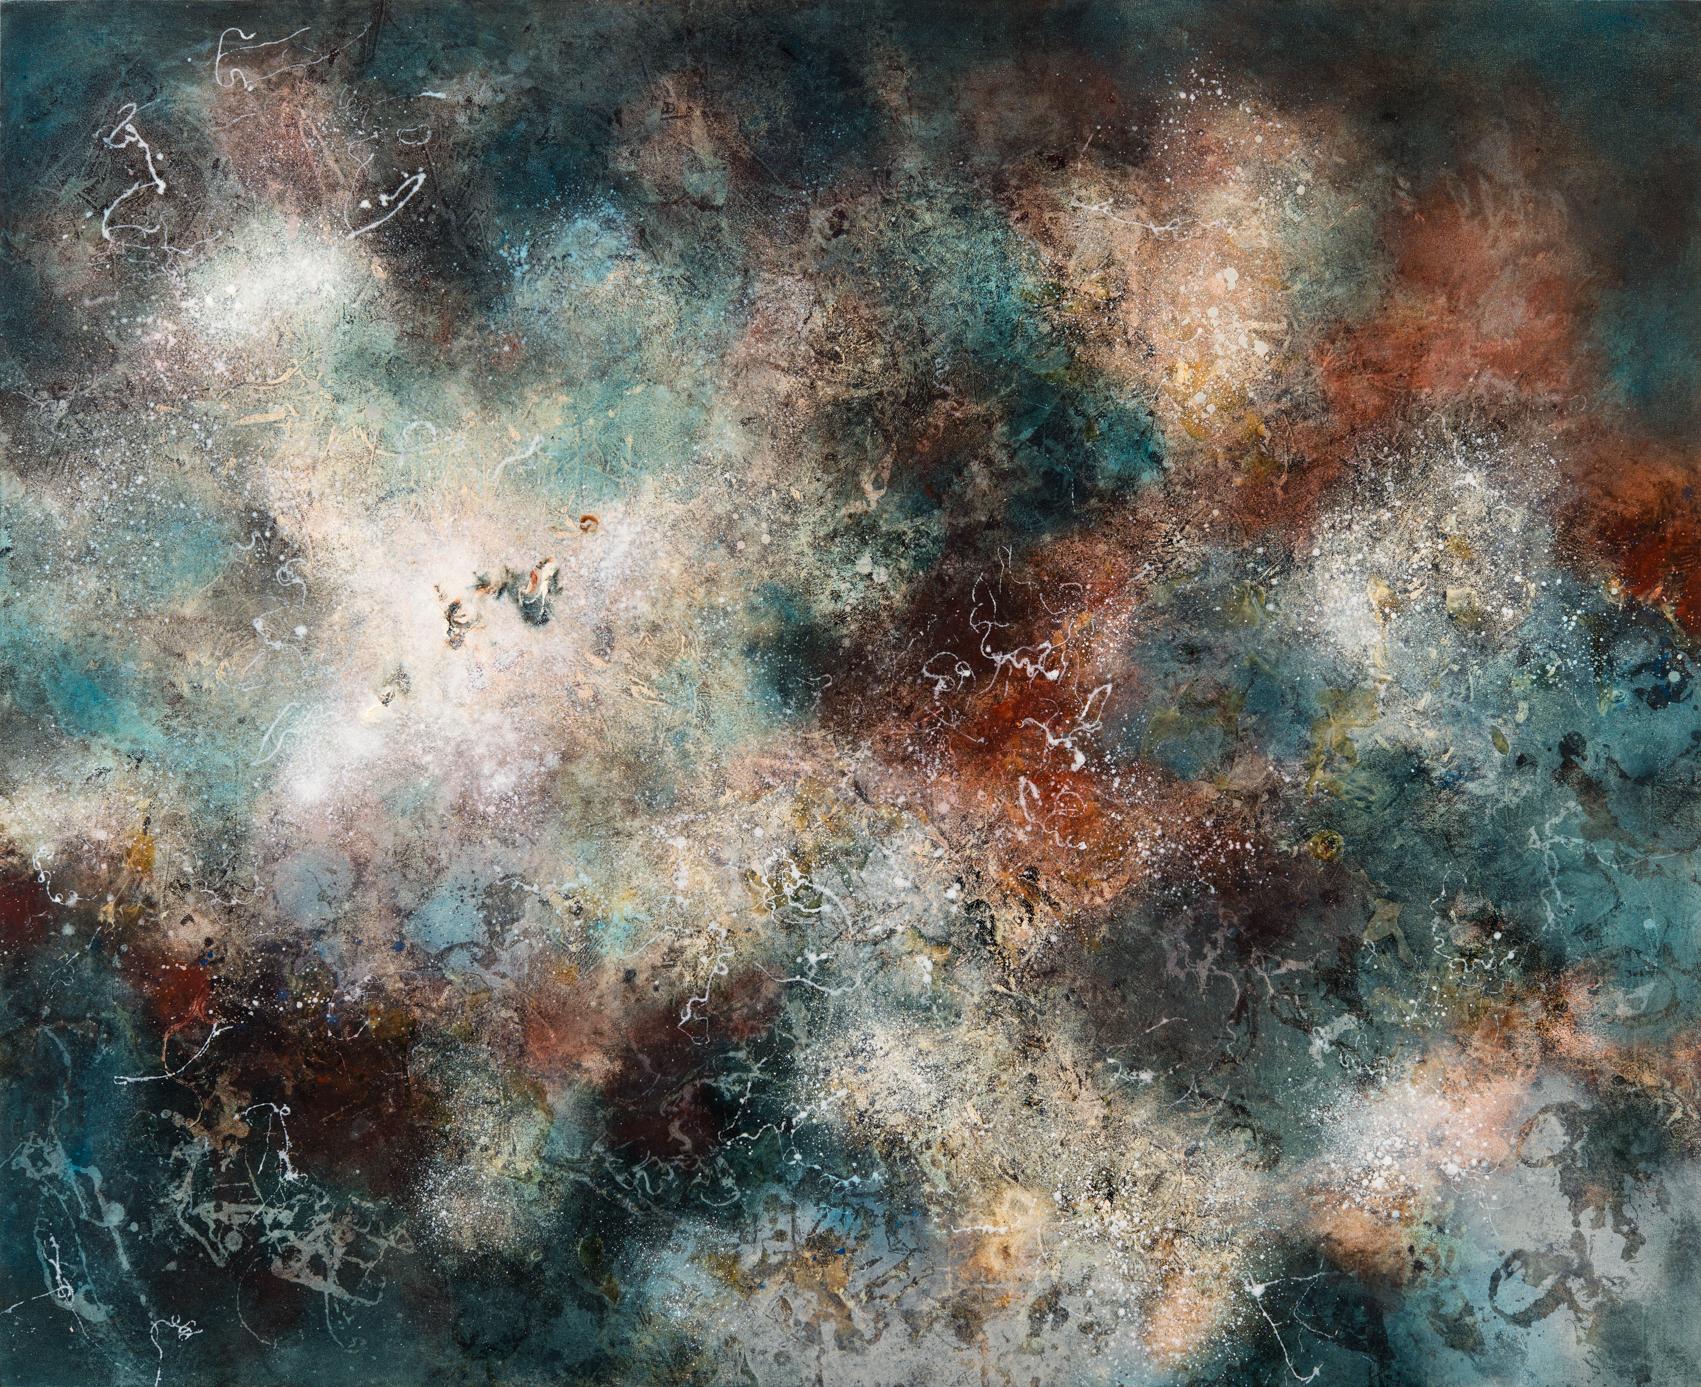 Nebula III, oil on canvas, 130 x 160 cm